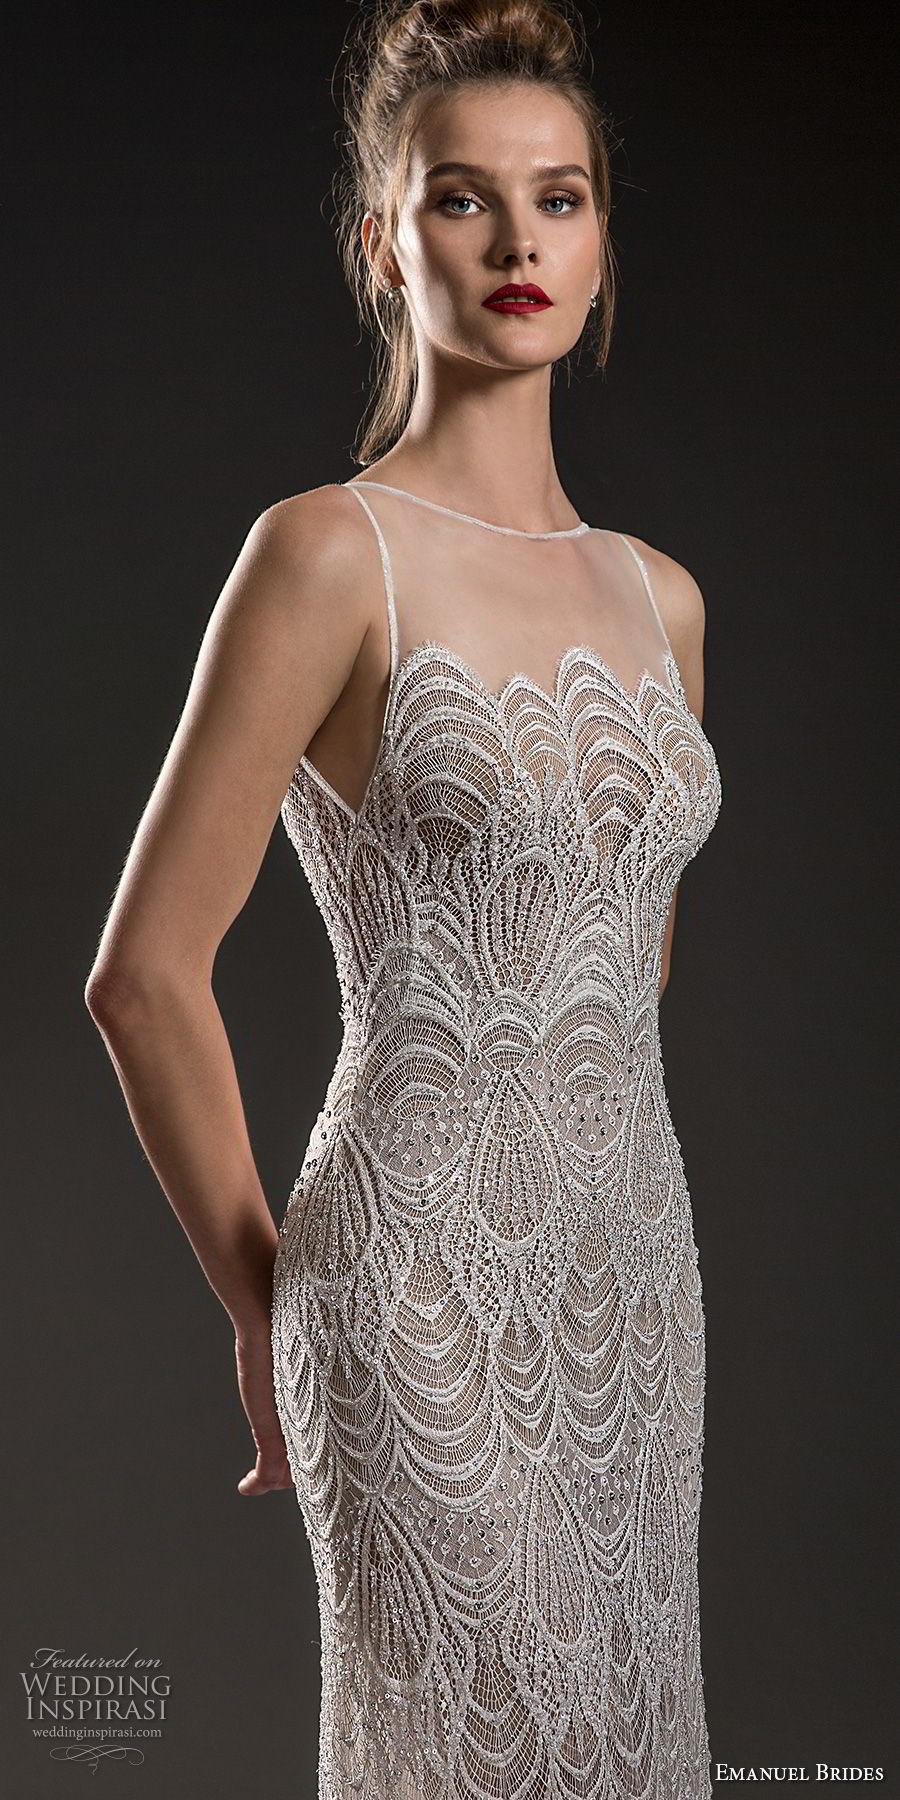 emanuel brides 2018 bridal sleeveless illusion bateau neck full embellishment elegant art deco sheath wedding dress sweep train (18) zv